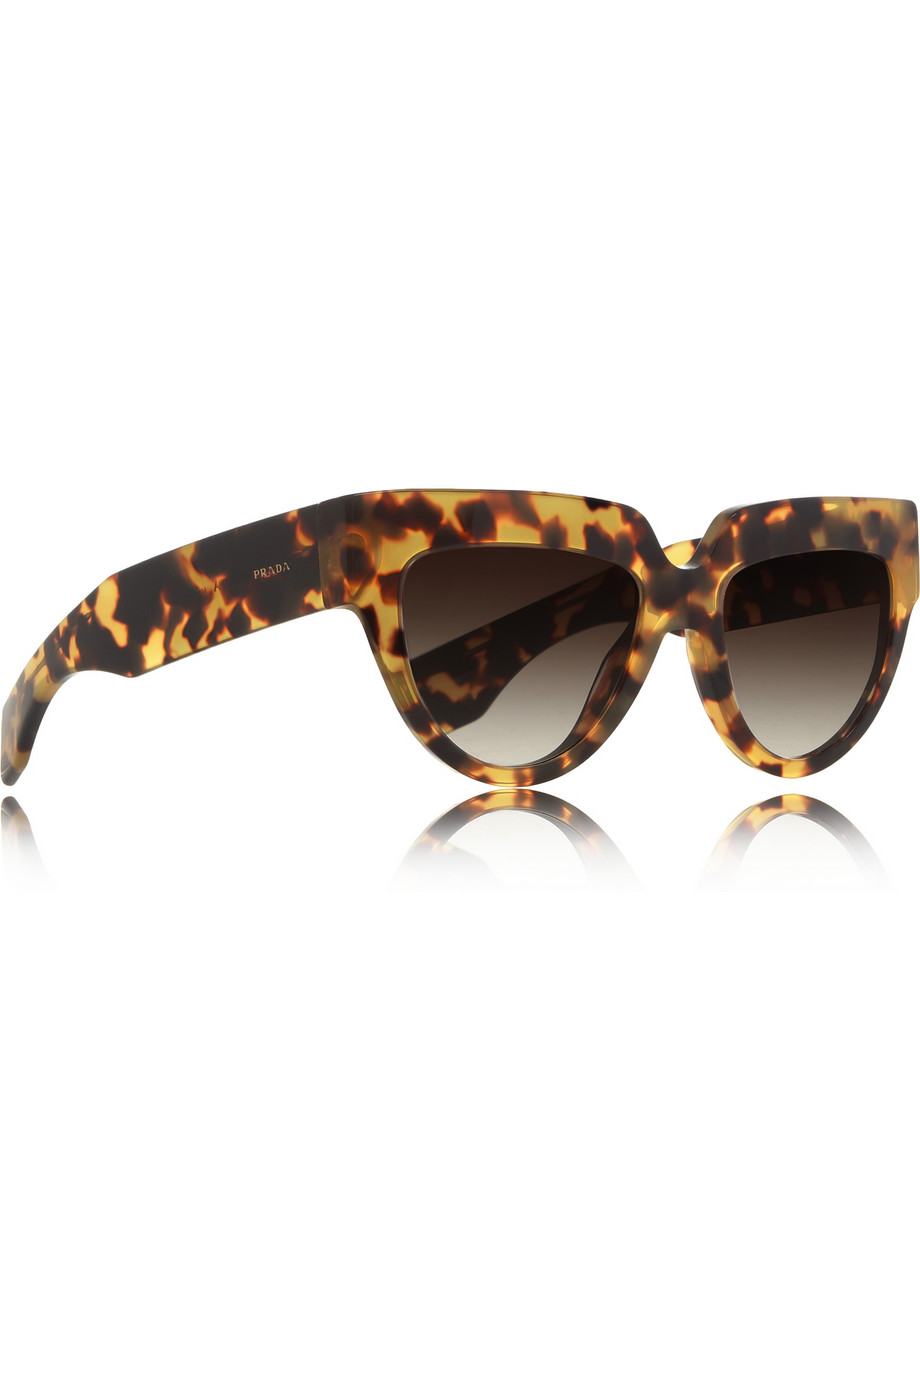 ac9e5ebd76 where to buy prada cat eye sunglasses tortoise 5eb37 12c49